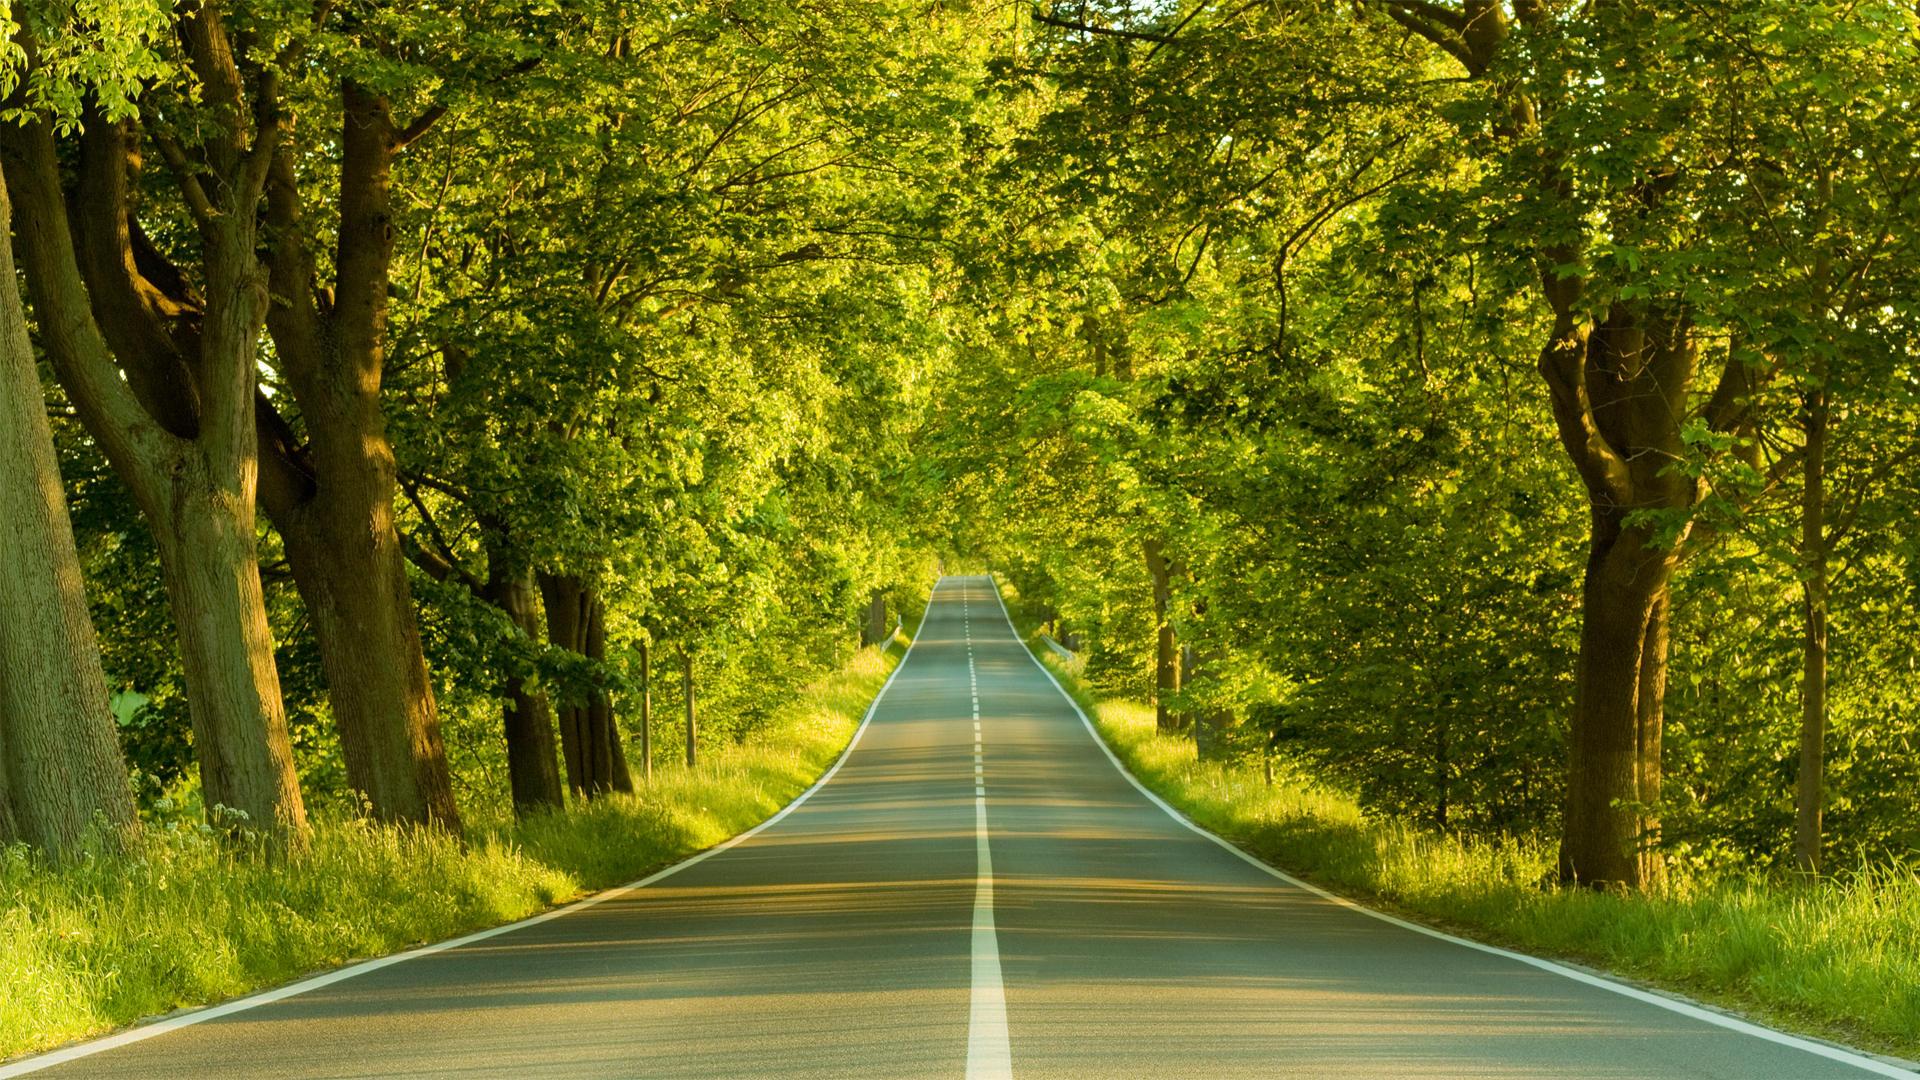 Forest Road Wallpaper HD